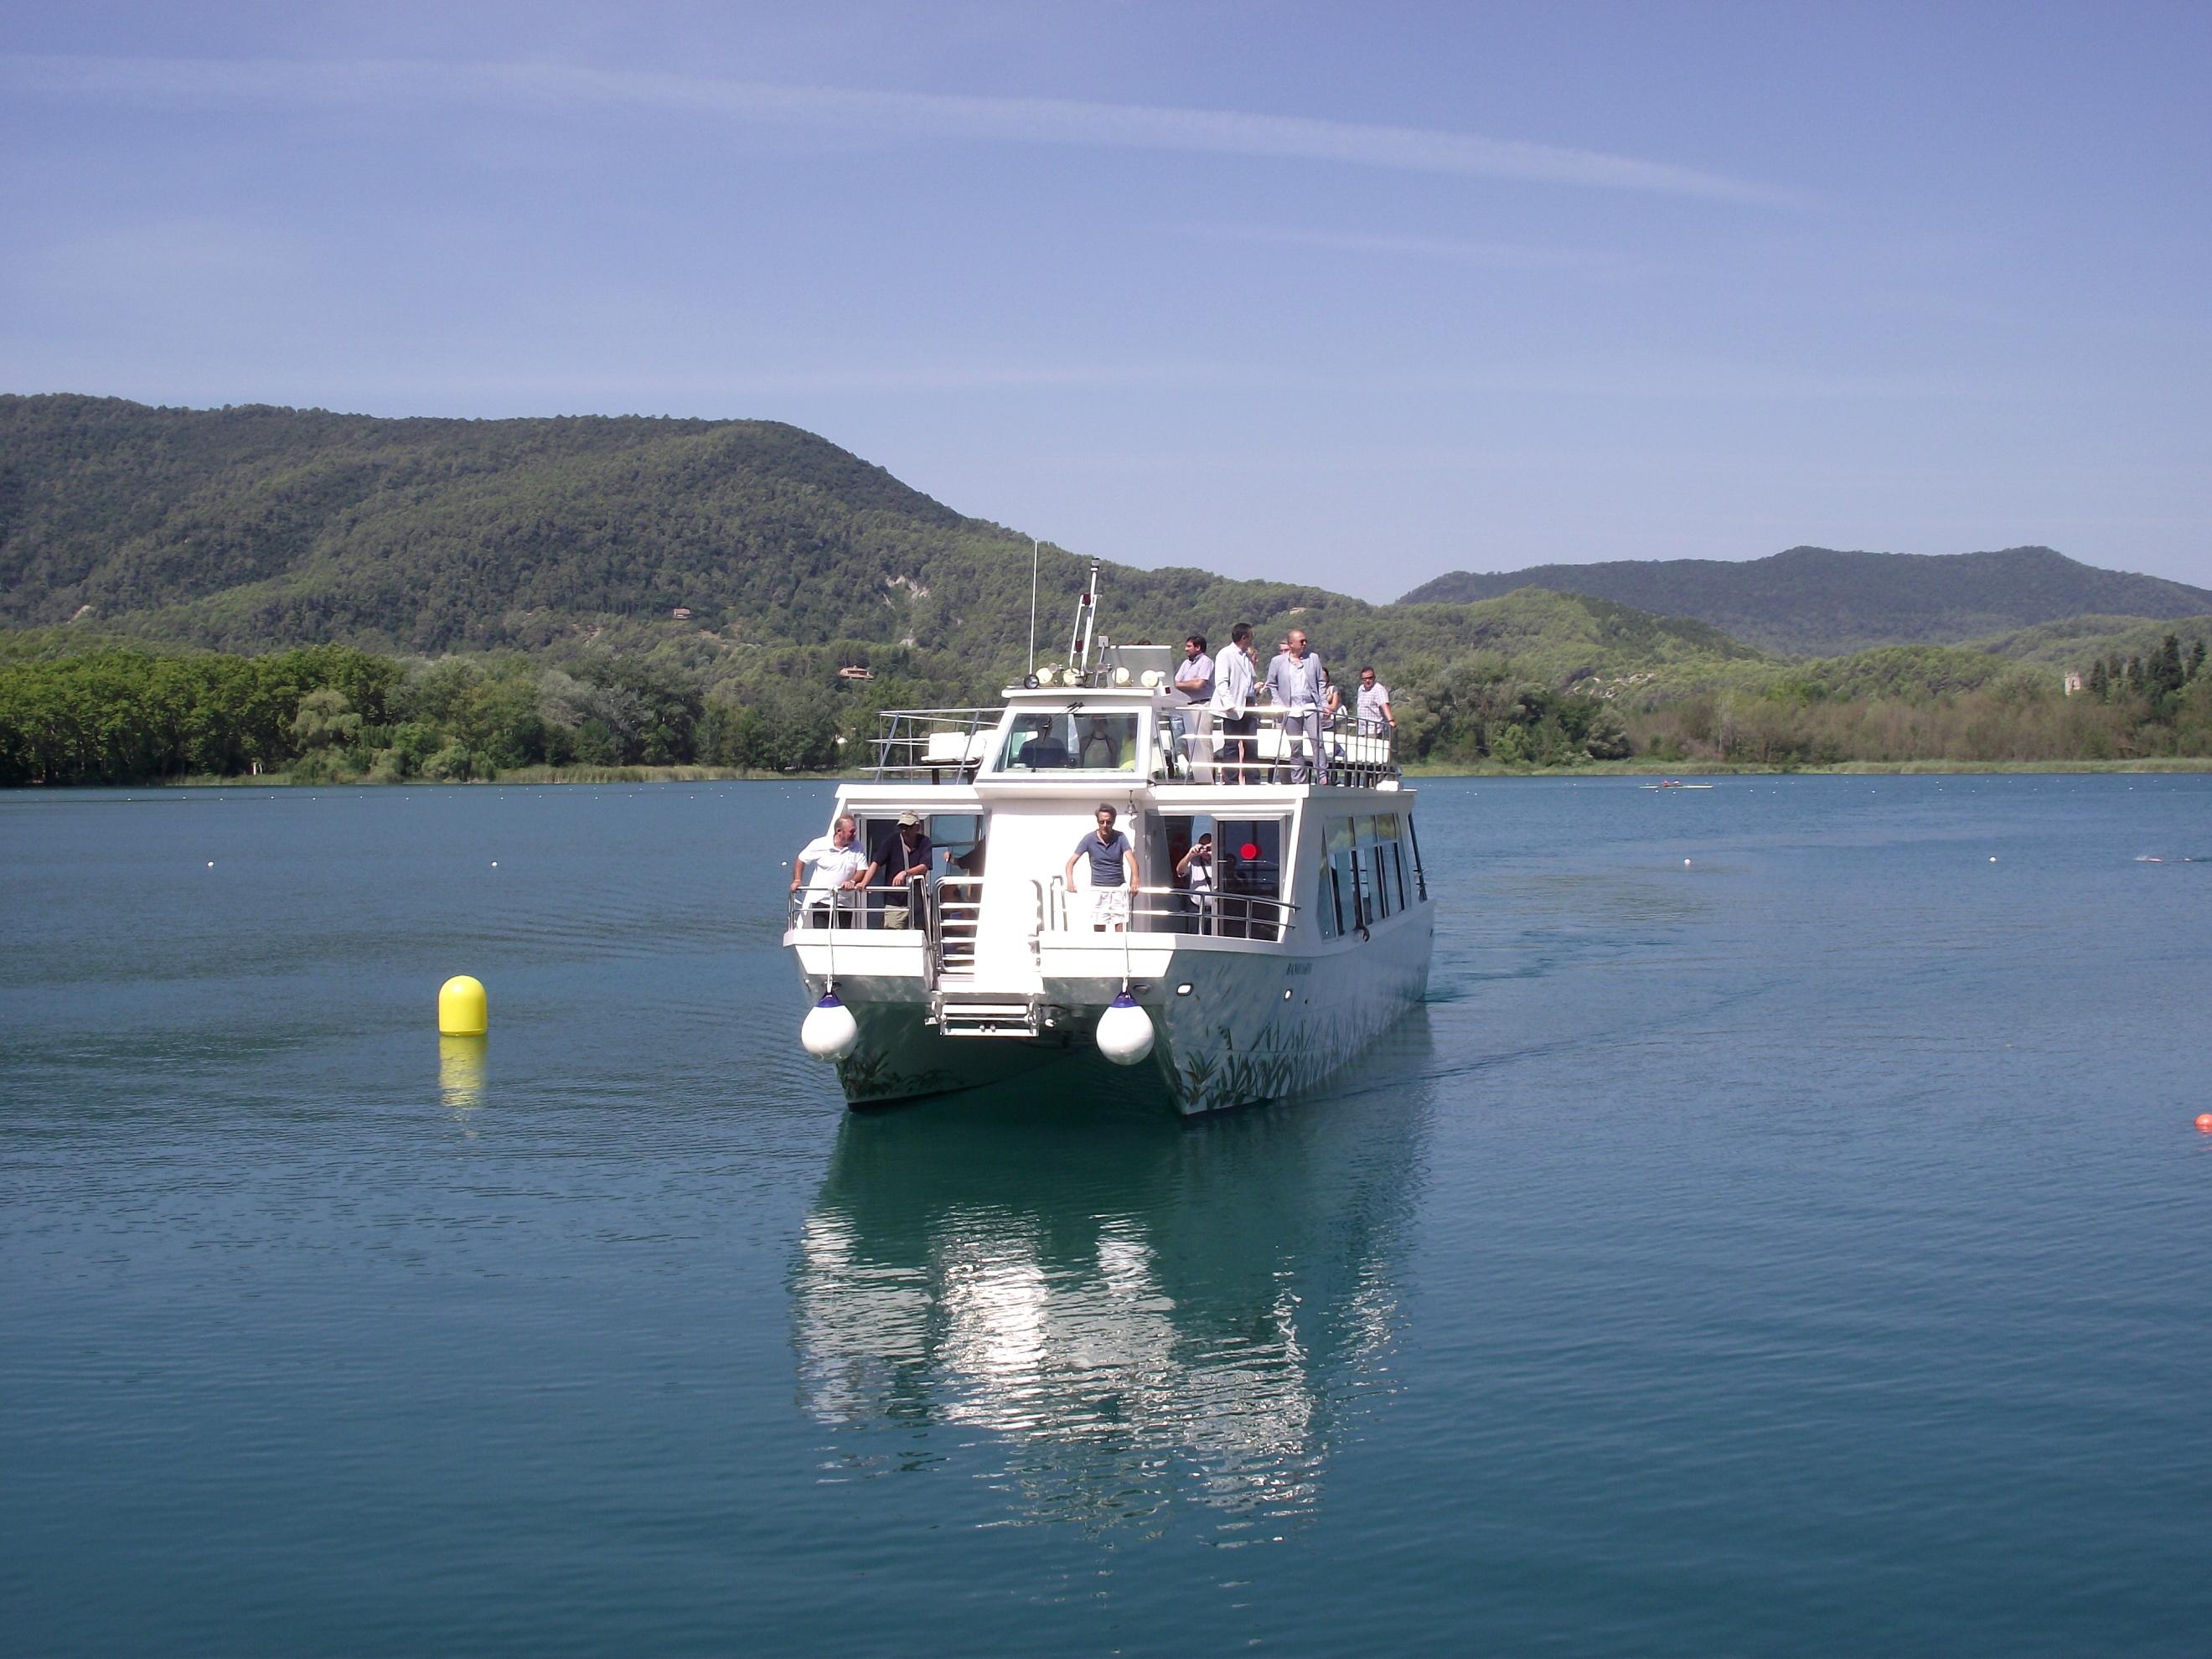 barca_tirona_banyoles_big.jpg - 1.36 MB